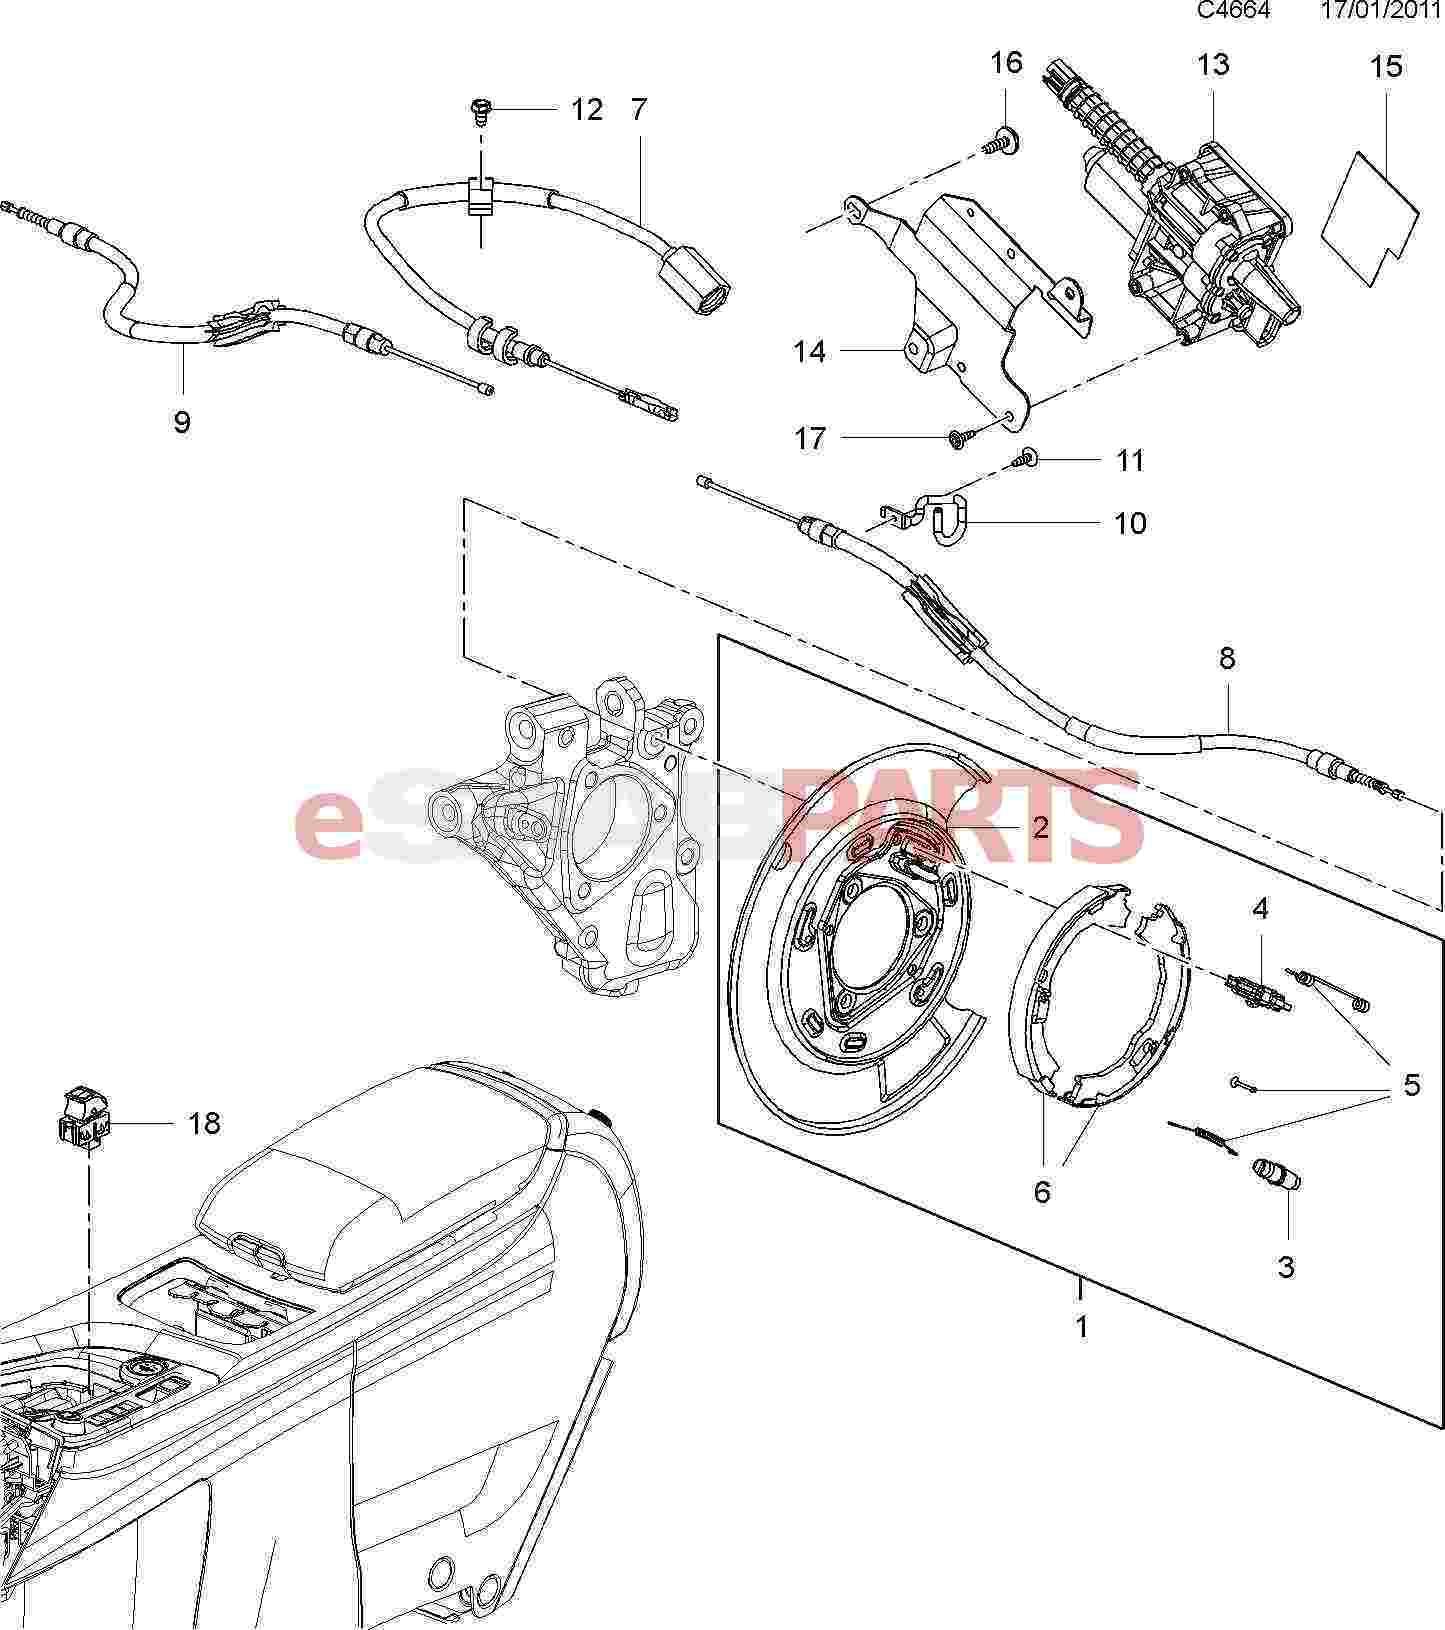 Saab 9 4x 168 Brakes Parts Parking Brake Emergency Diagram Electric